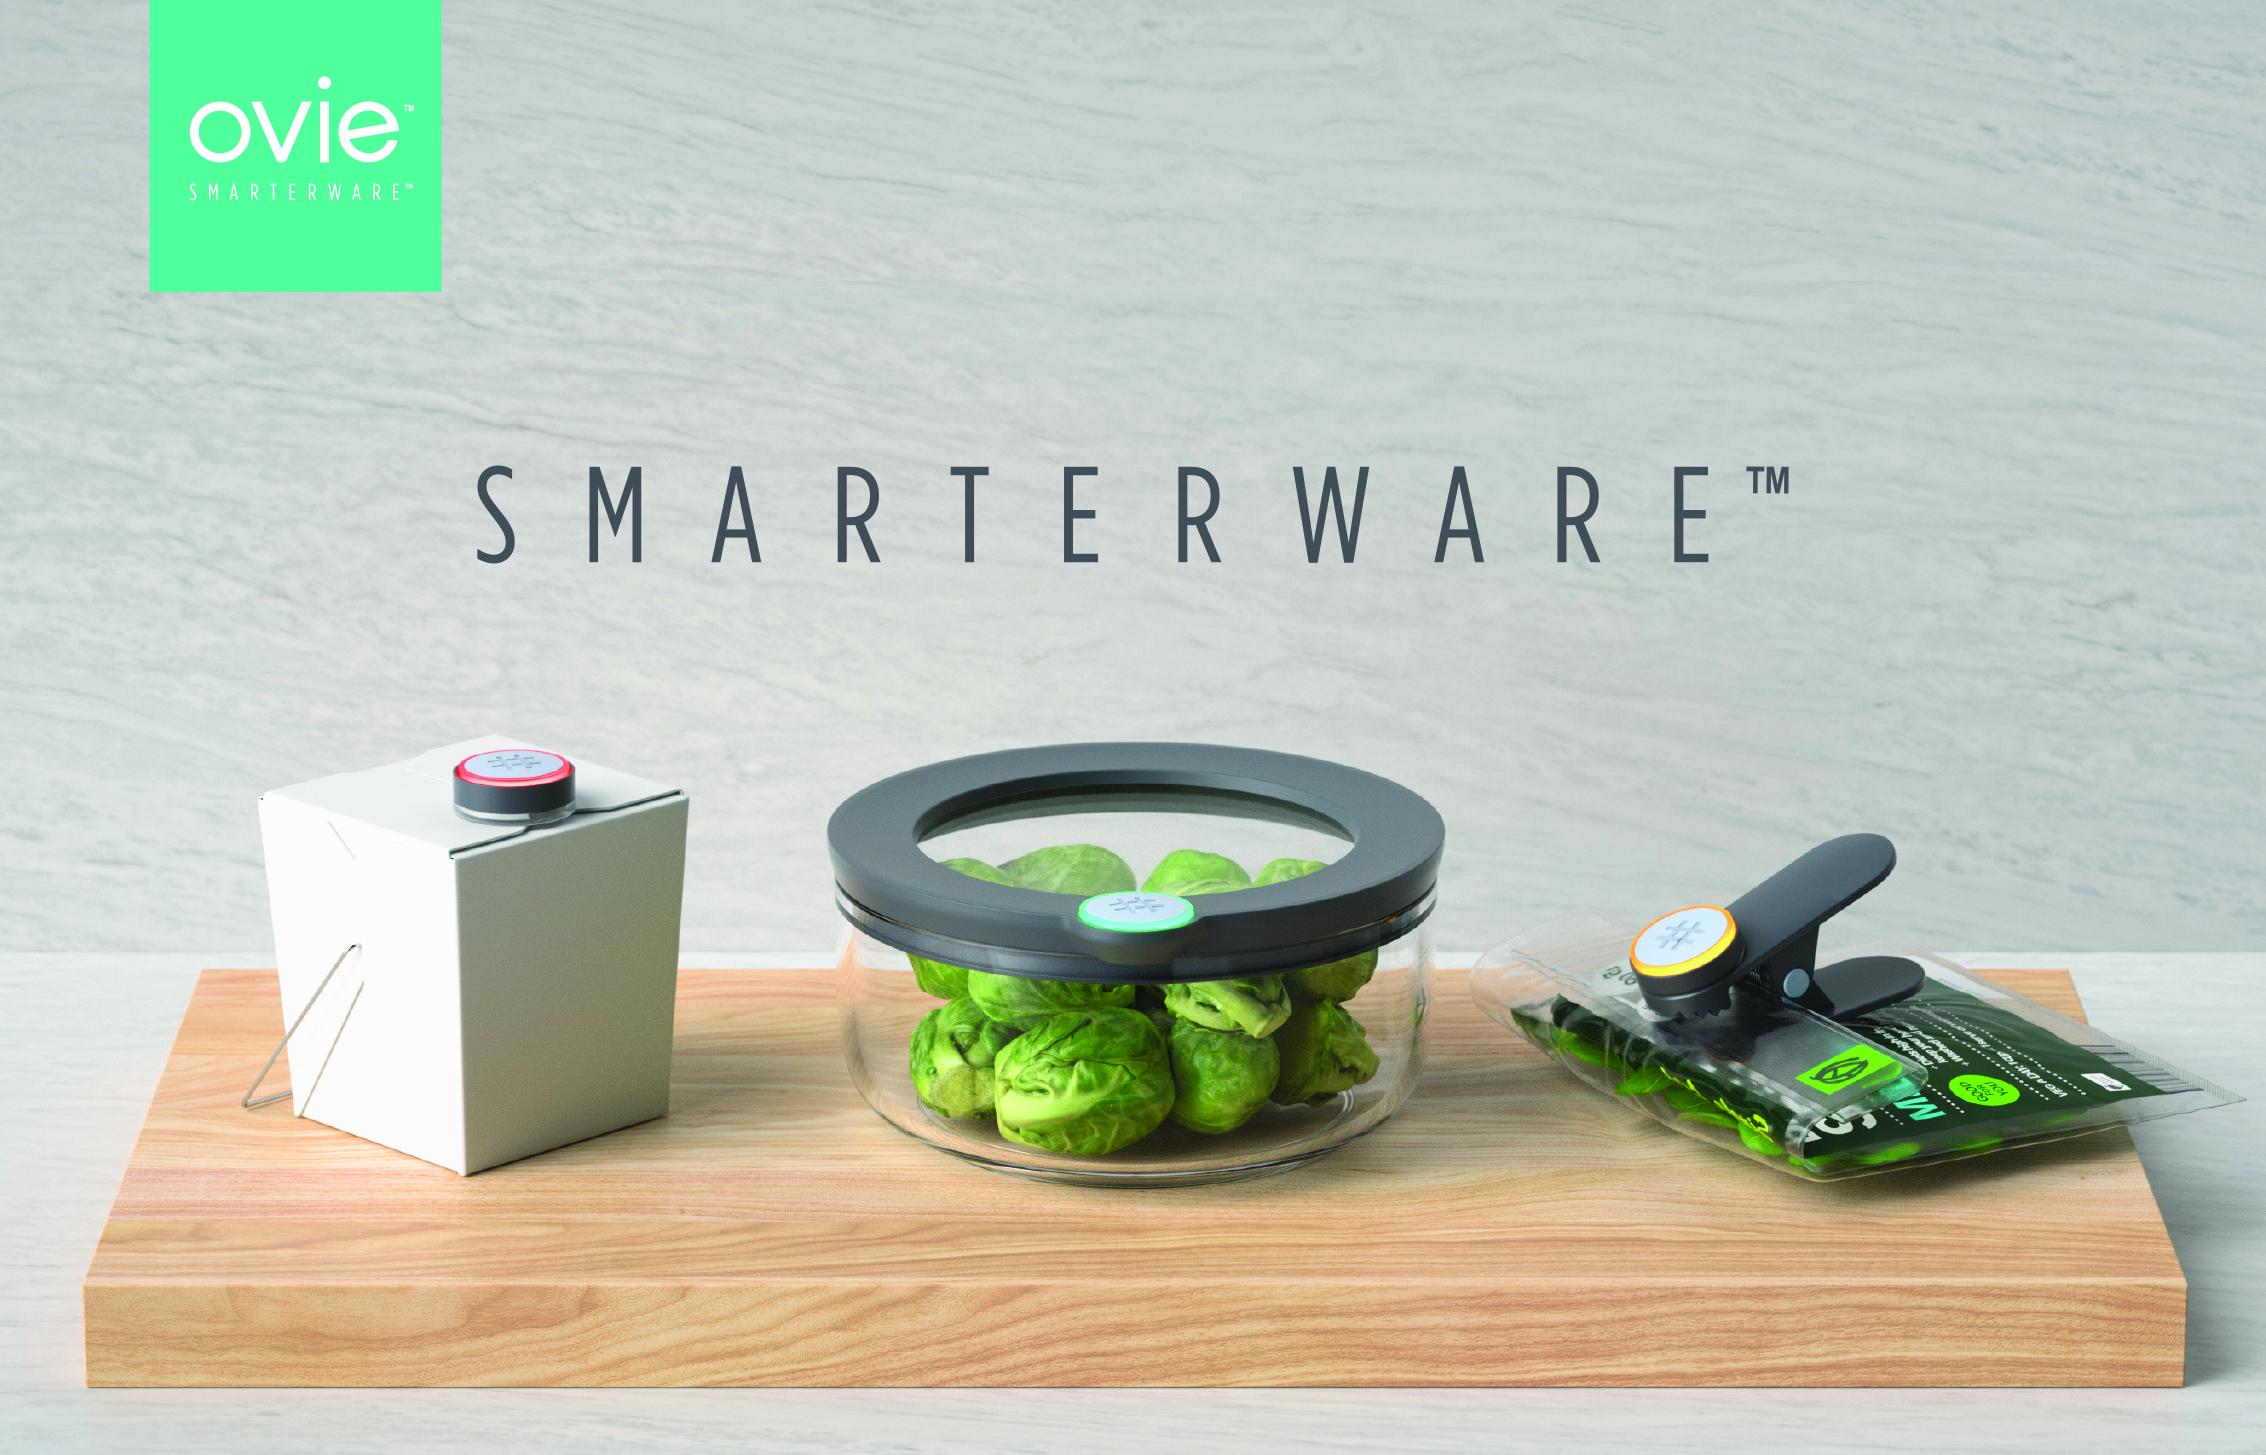 Ovie_Smarterware.jpg